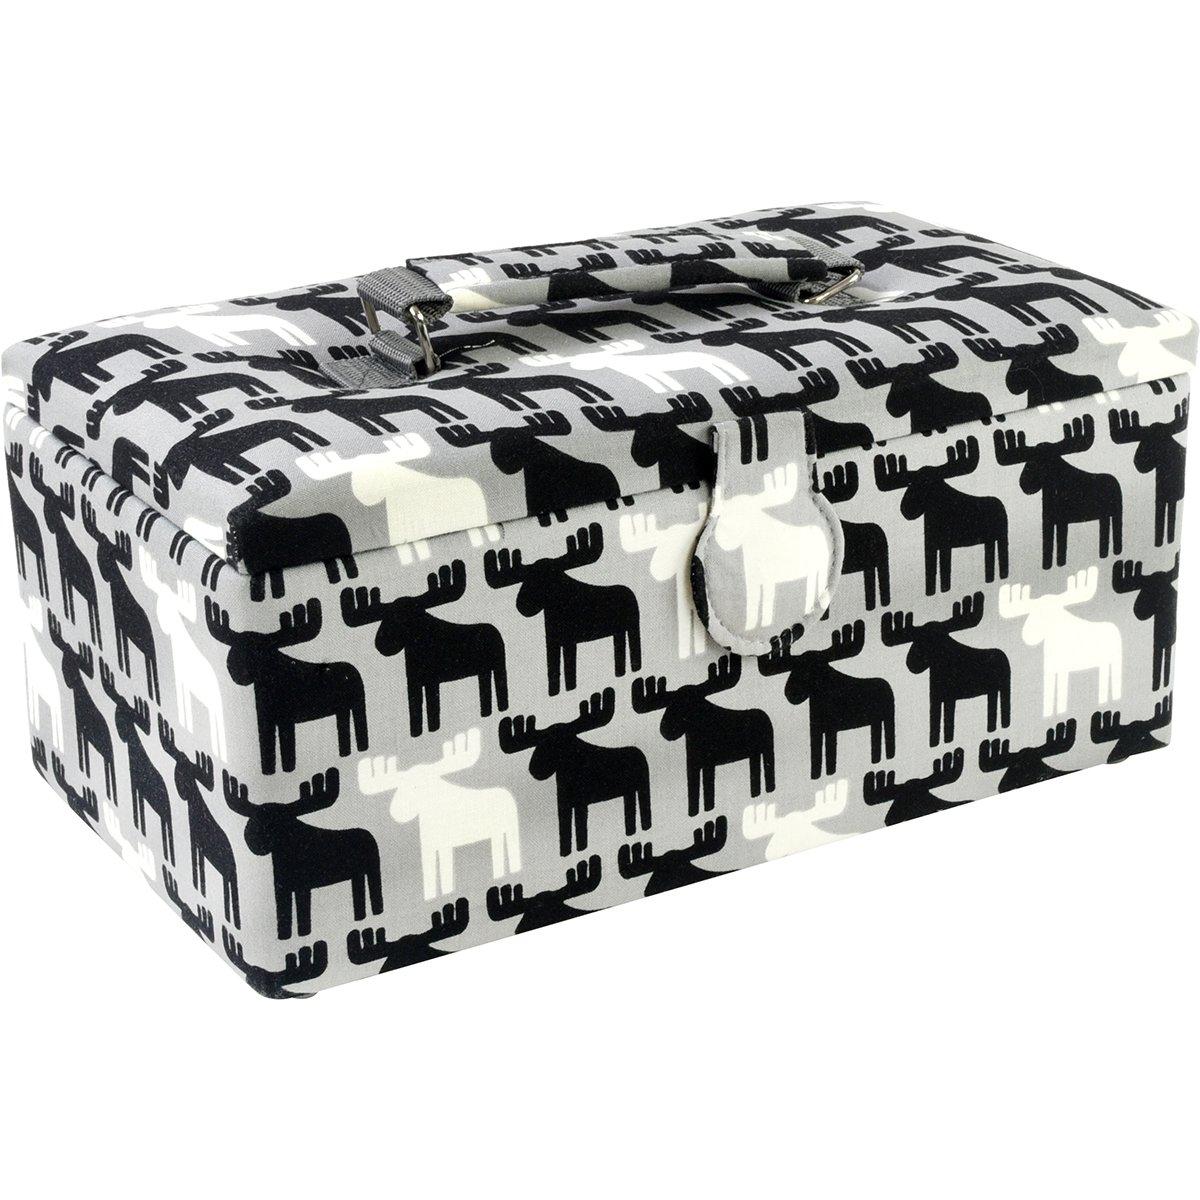 Saint Jane St Jane Sewing Basket Large Oval Metal Hndl Ntions BasketLargeOvalMetalHndlNtions Black//White